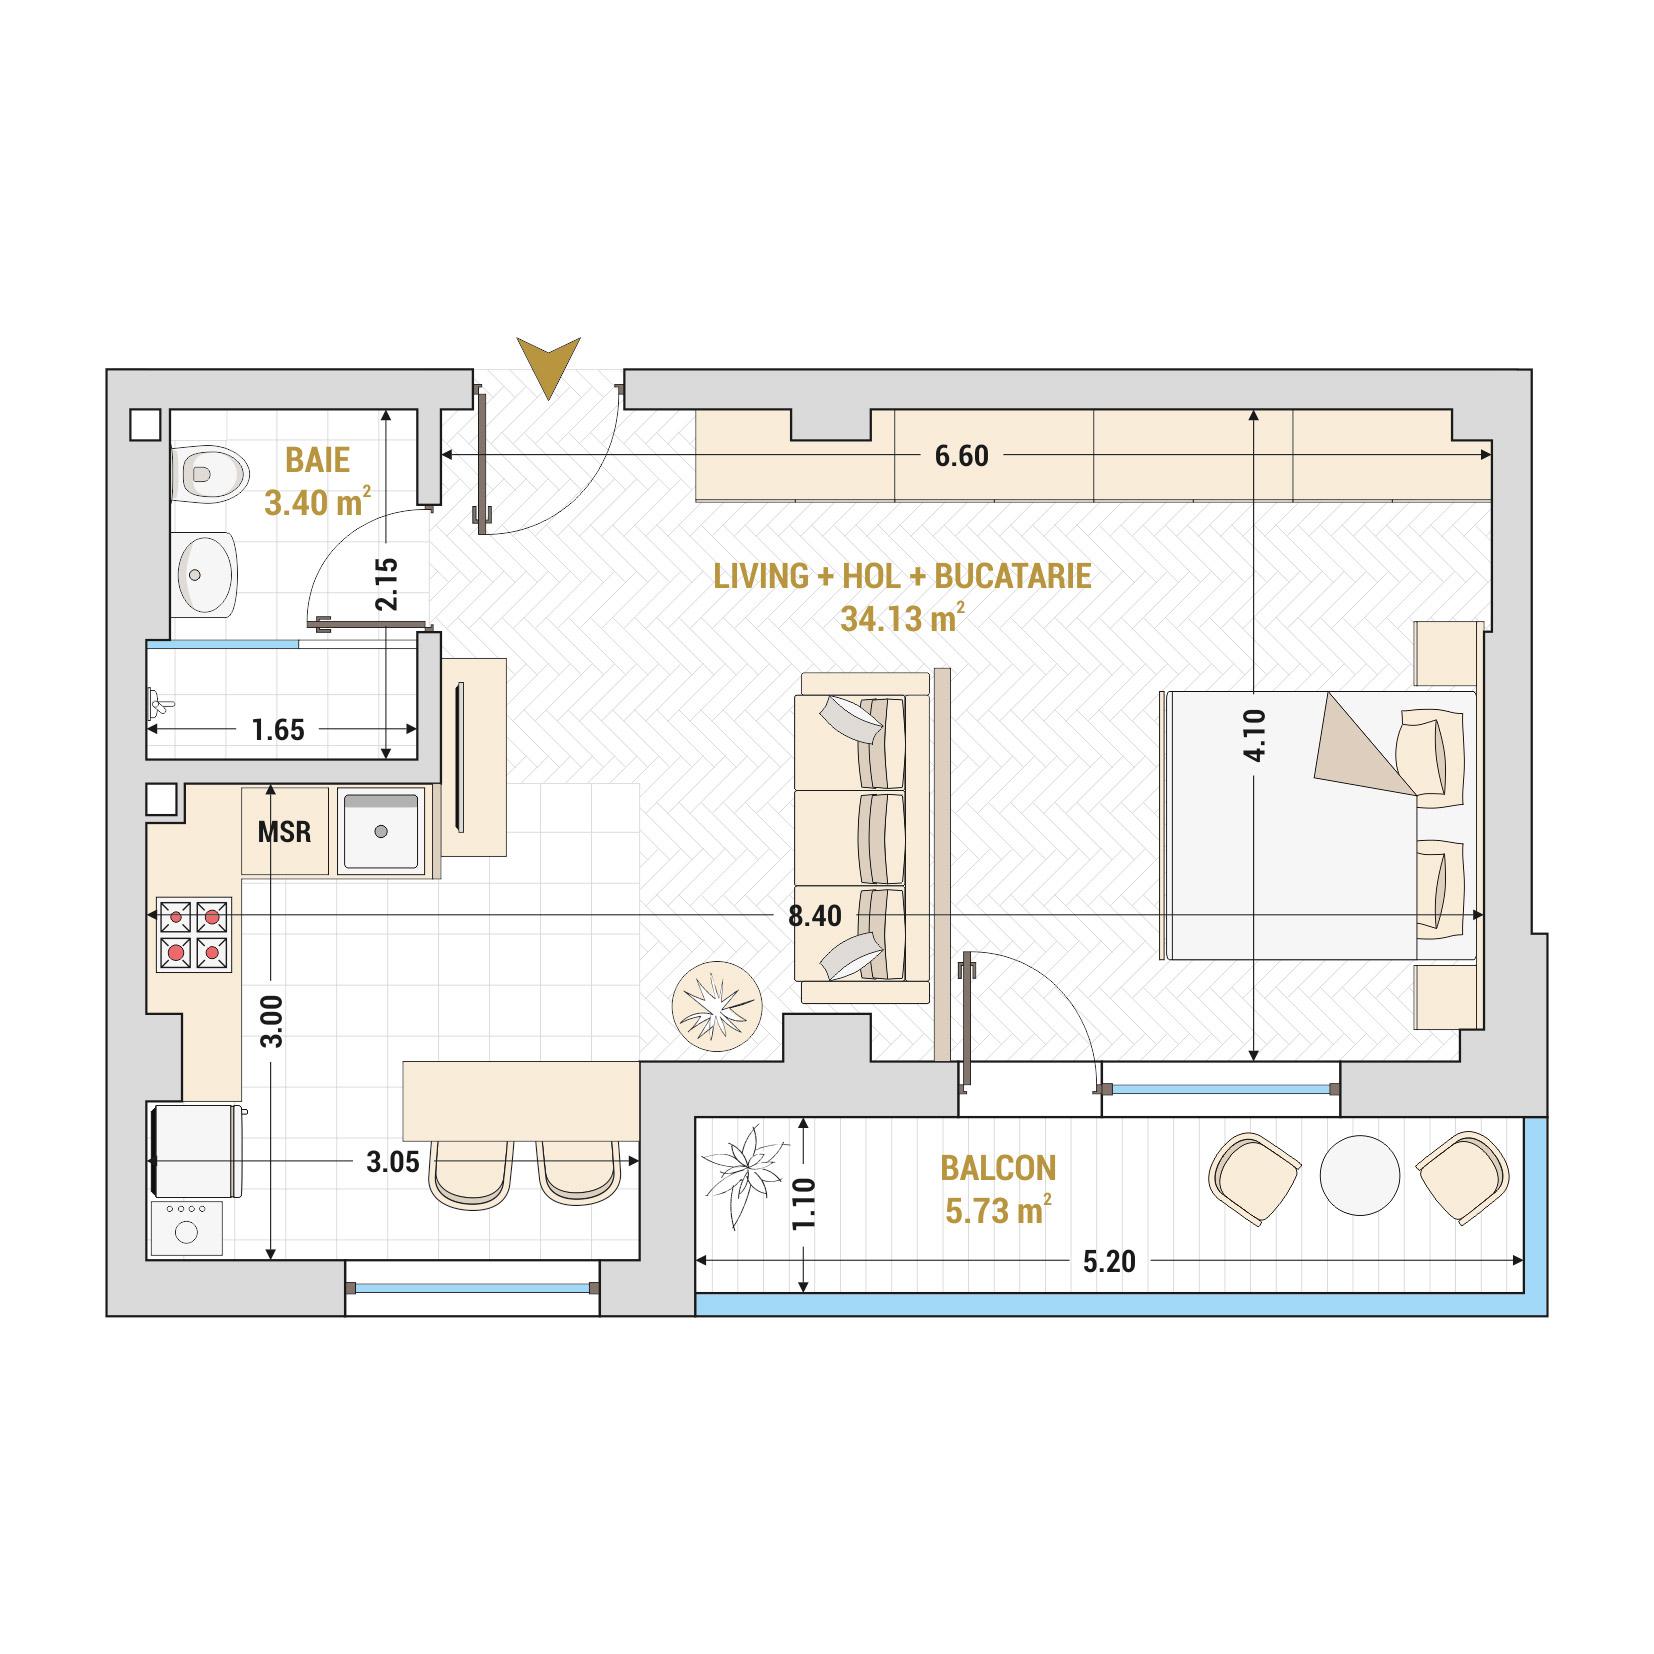 Garsoniere de vanzare Bucuresti - Catedral Residence - Marriott, Piata Unirii, 13 Septembrie, Izvor - Tip 4 - T1A